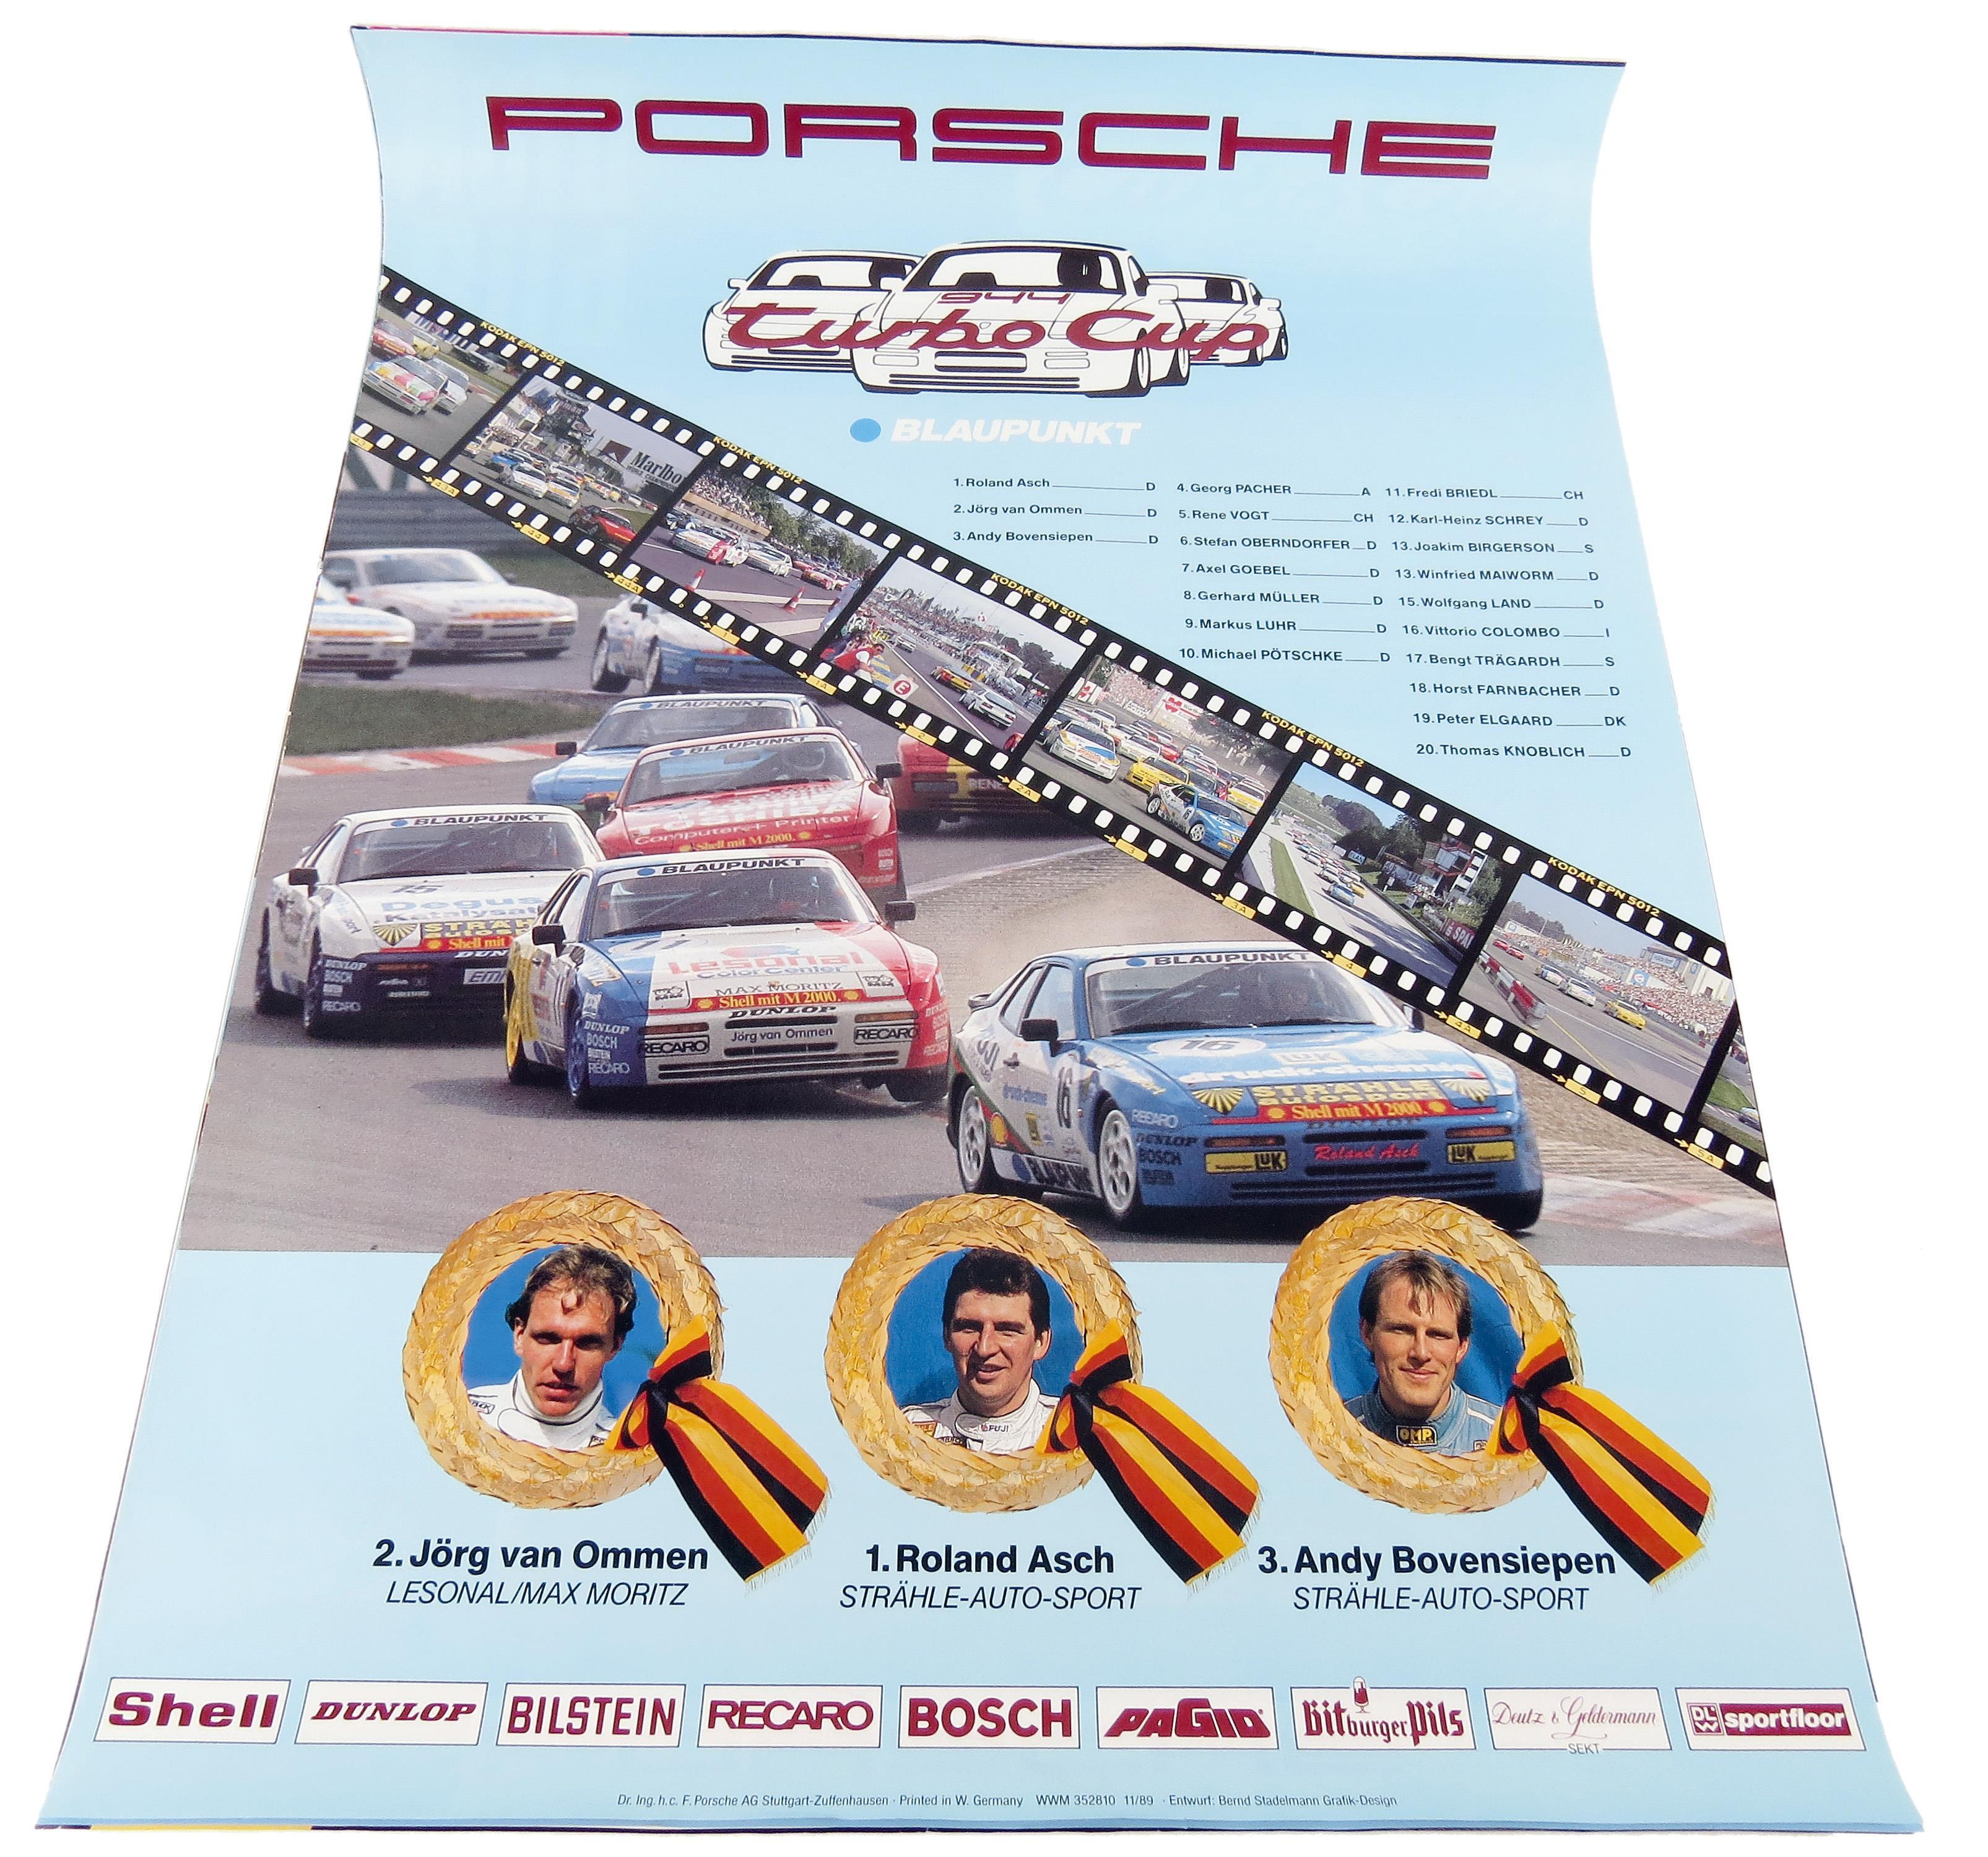 Collector Studio Fine Automotive Memorabilia 1989 Porsche 944 Turbo Cup Factory Poster